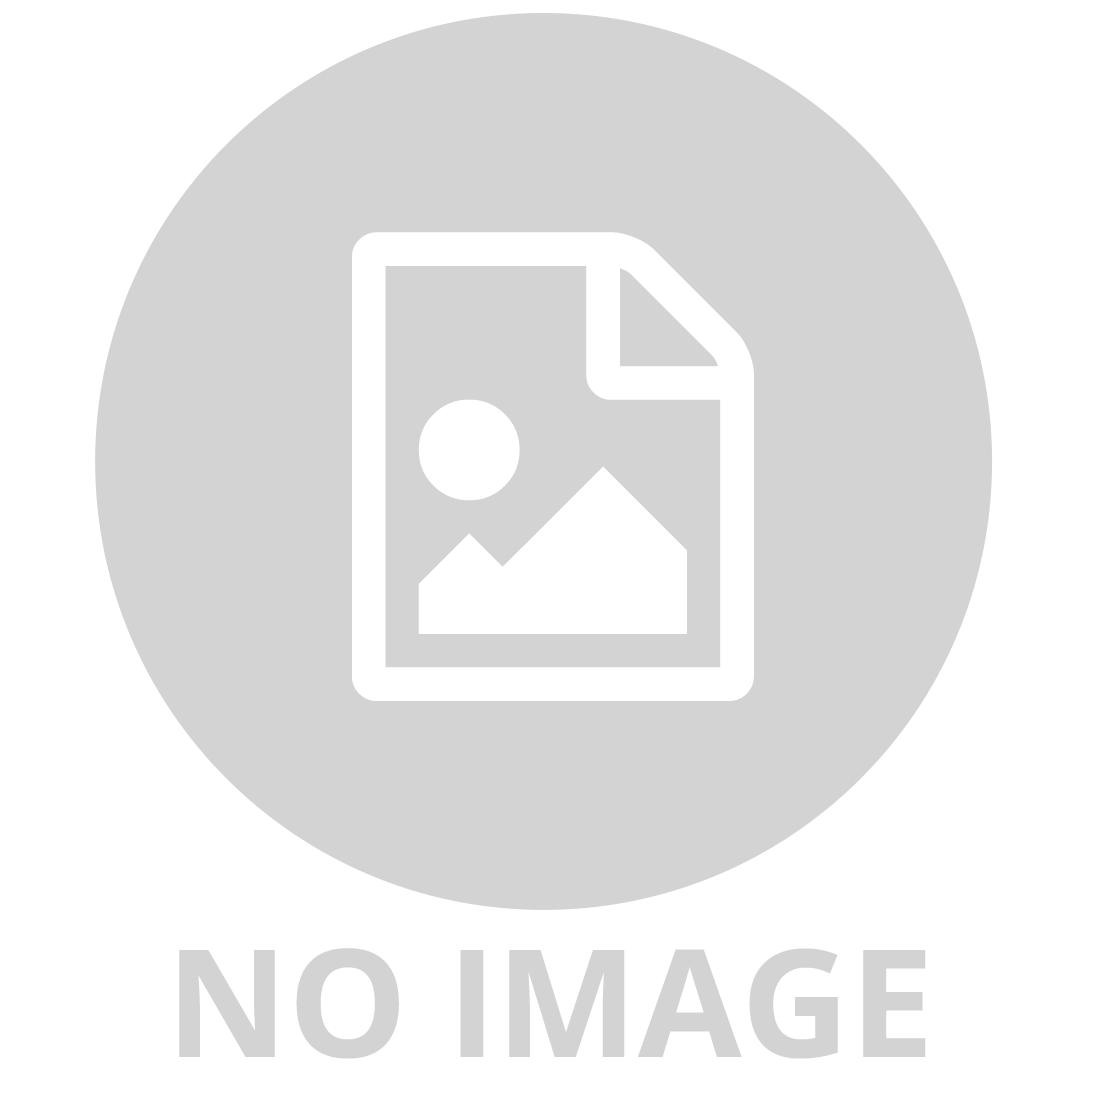 RUBIK S 4 X 4 CUBE